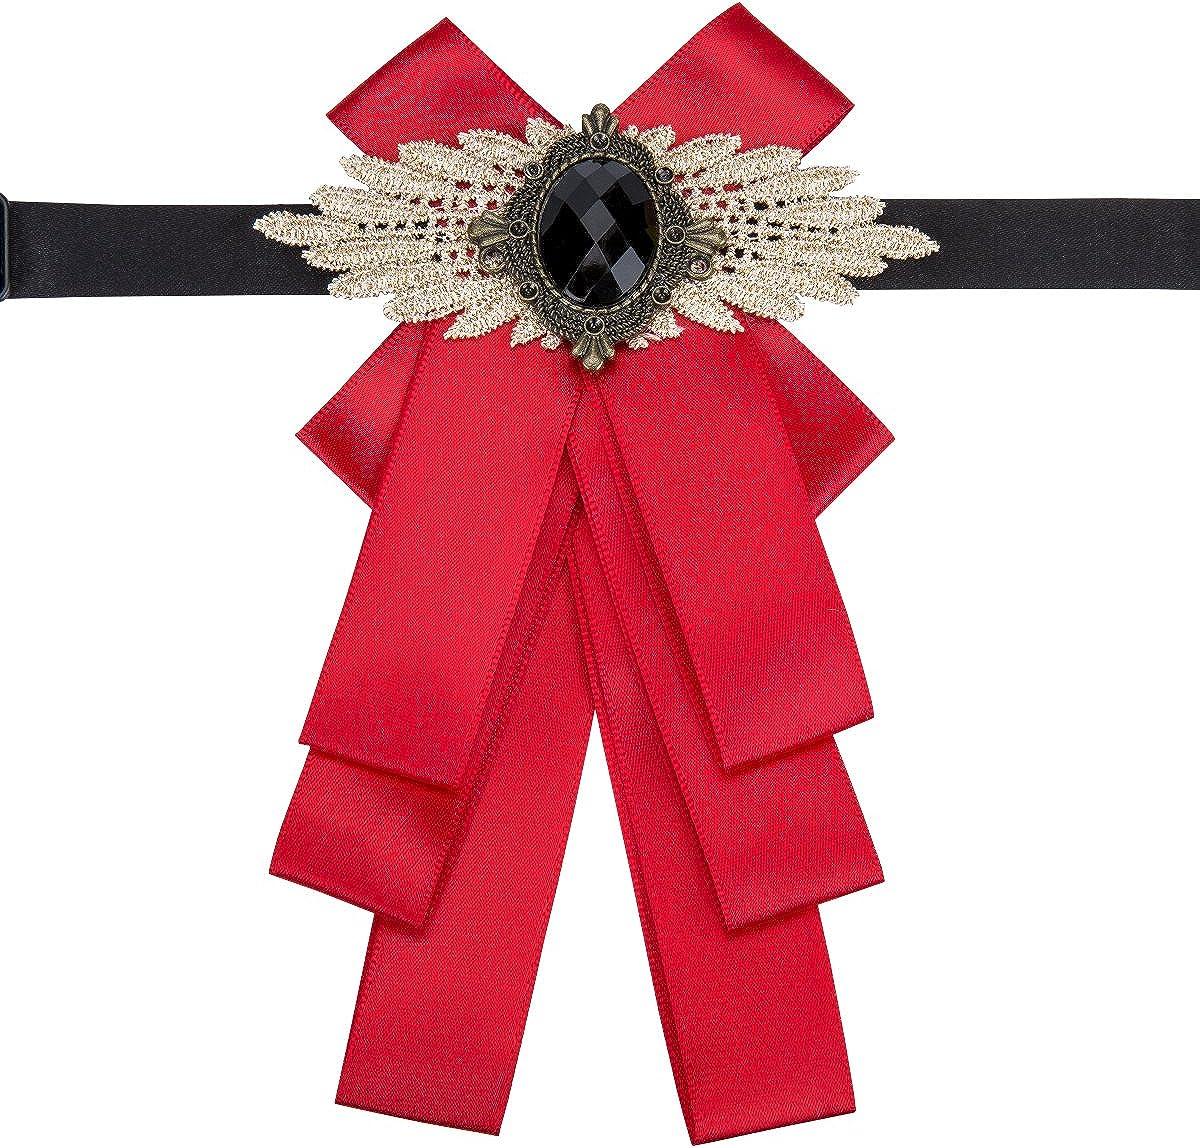 Dubulle Wedding Bow tie Bowknot Necktie Wedding Bridegroom Host Gift Ribbon Pre-tied Bow Tie